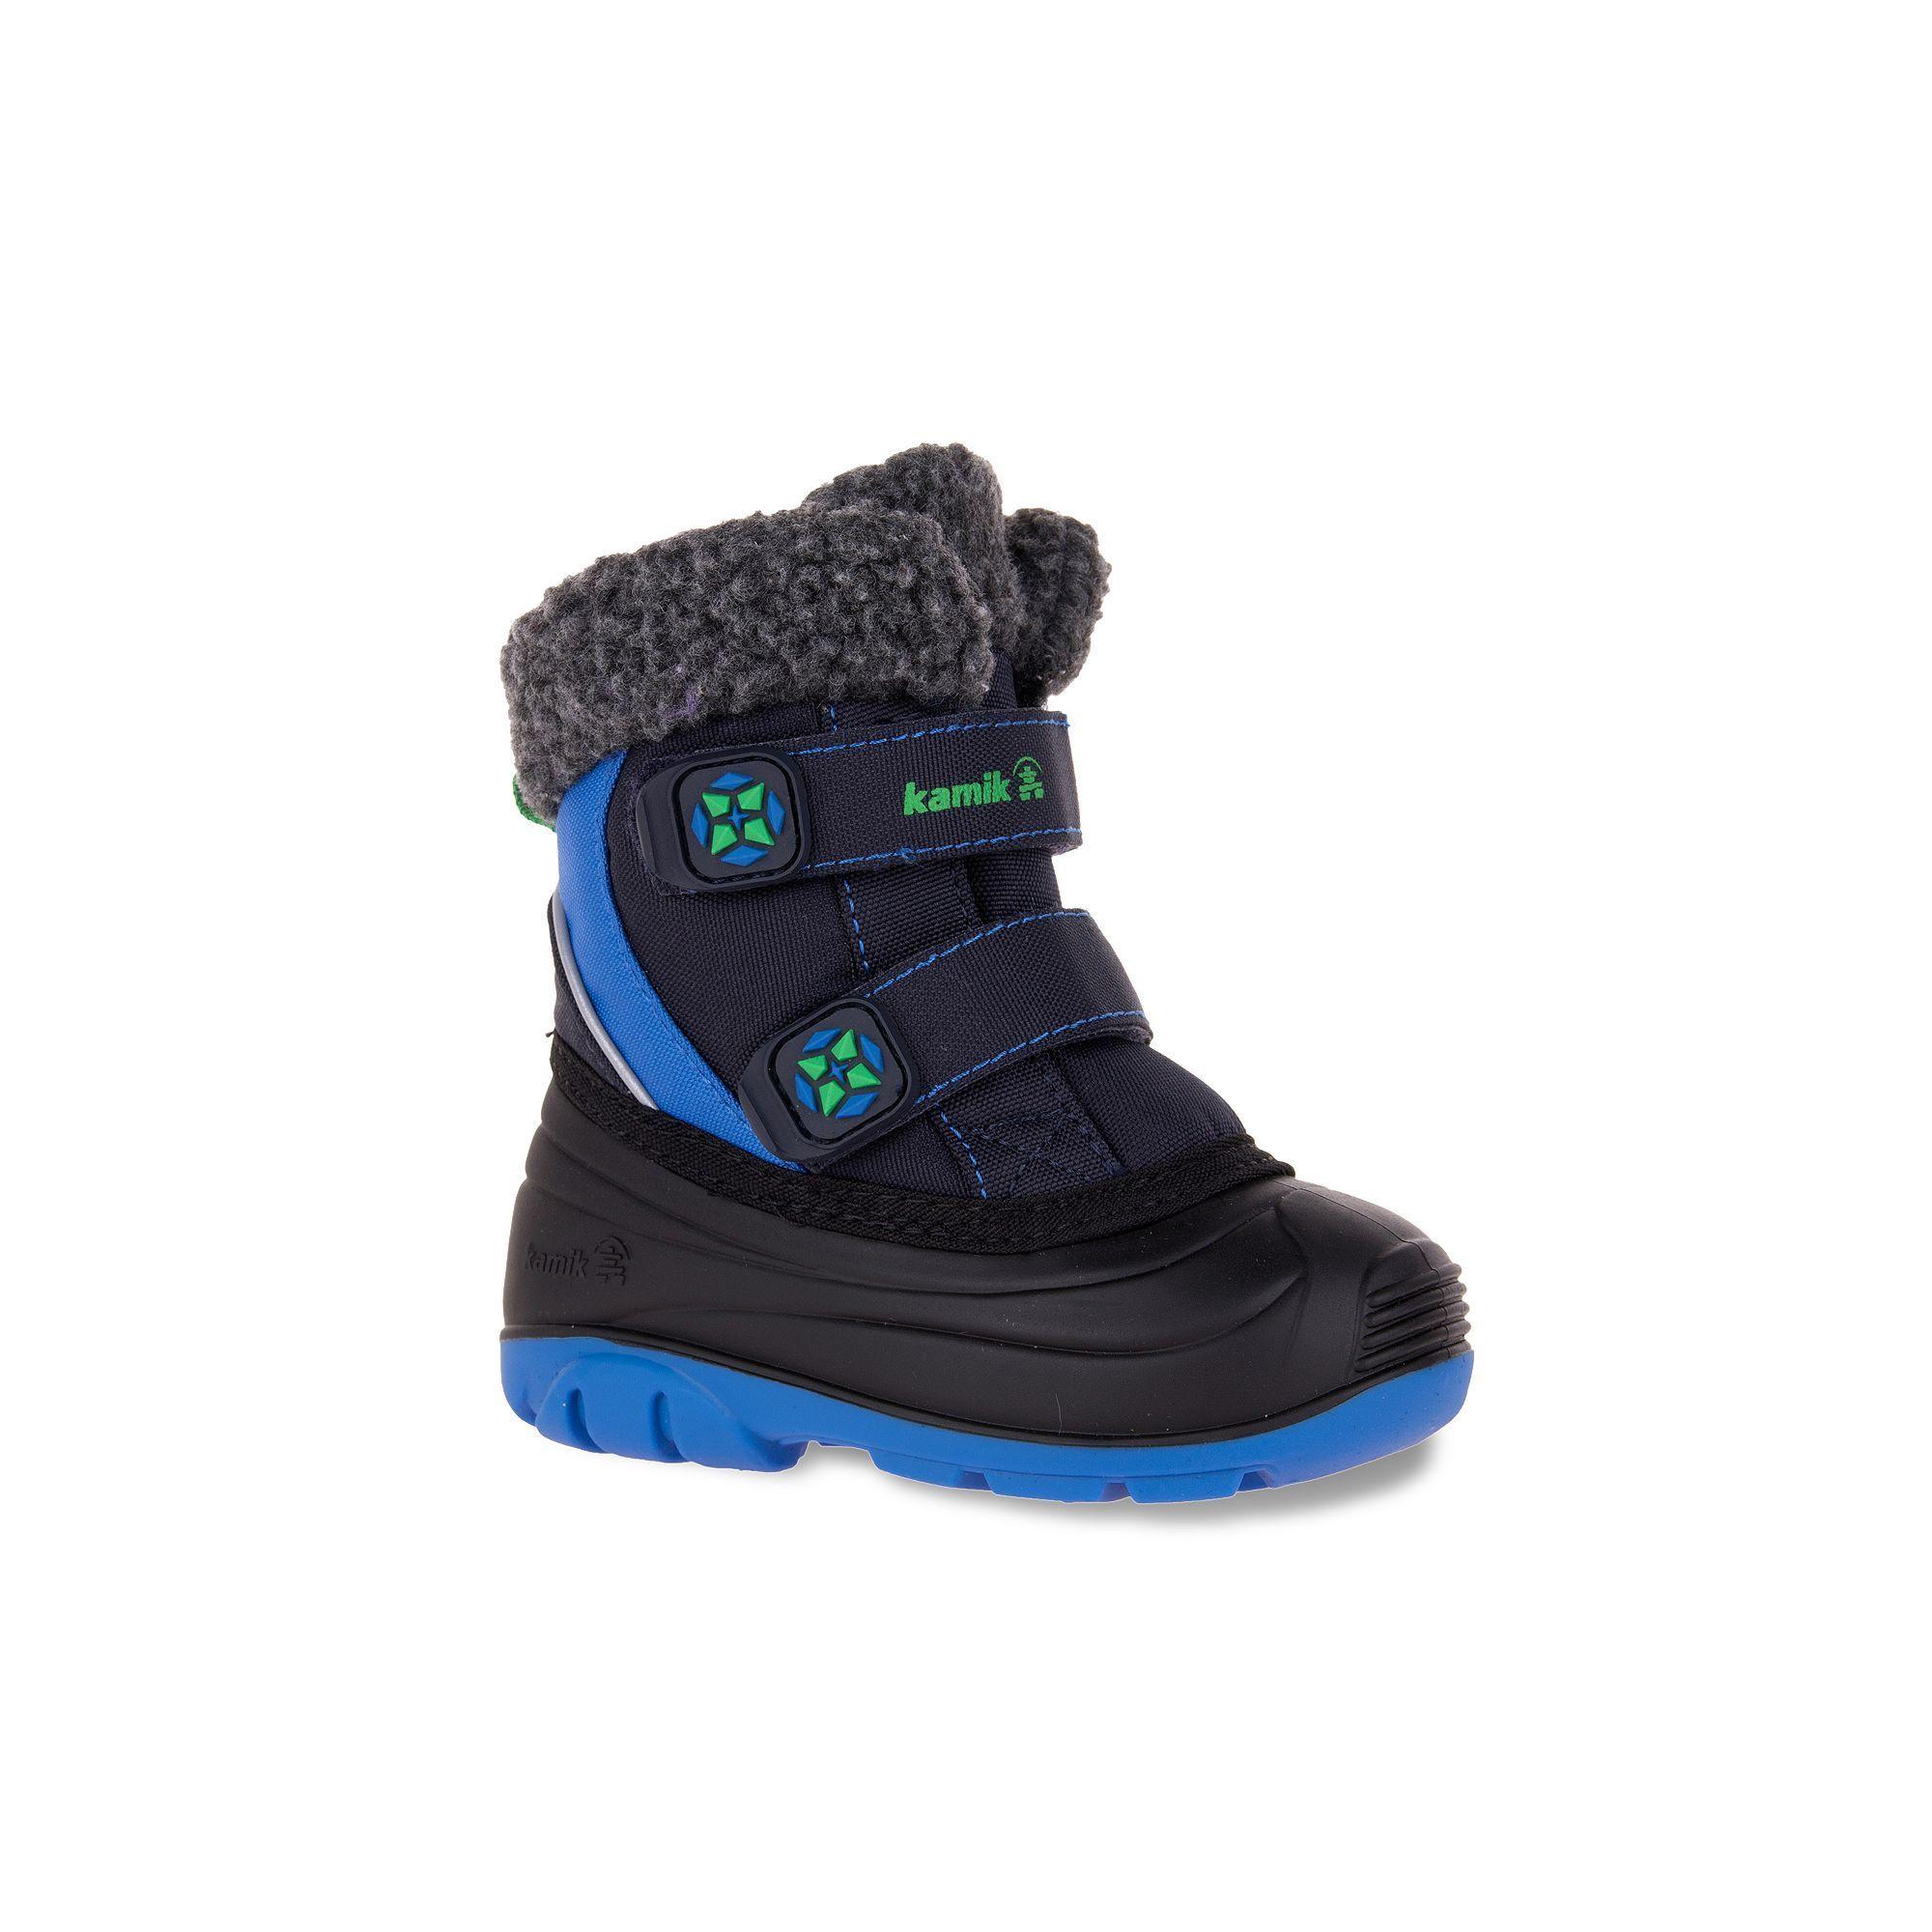 03308f4a267f Kamik Clover Toddler Boys  Waterproof Winter Boots